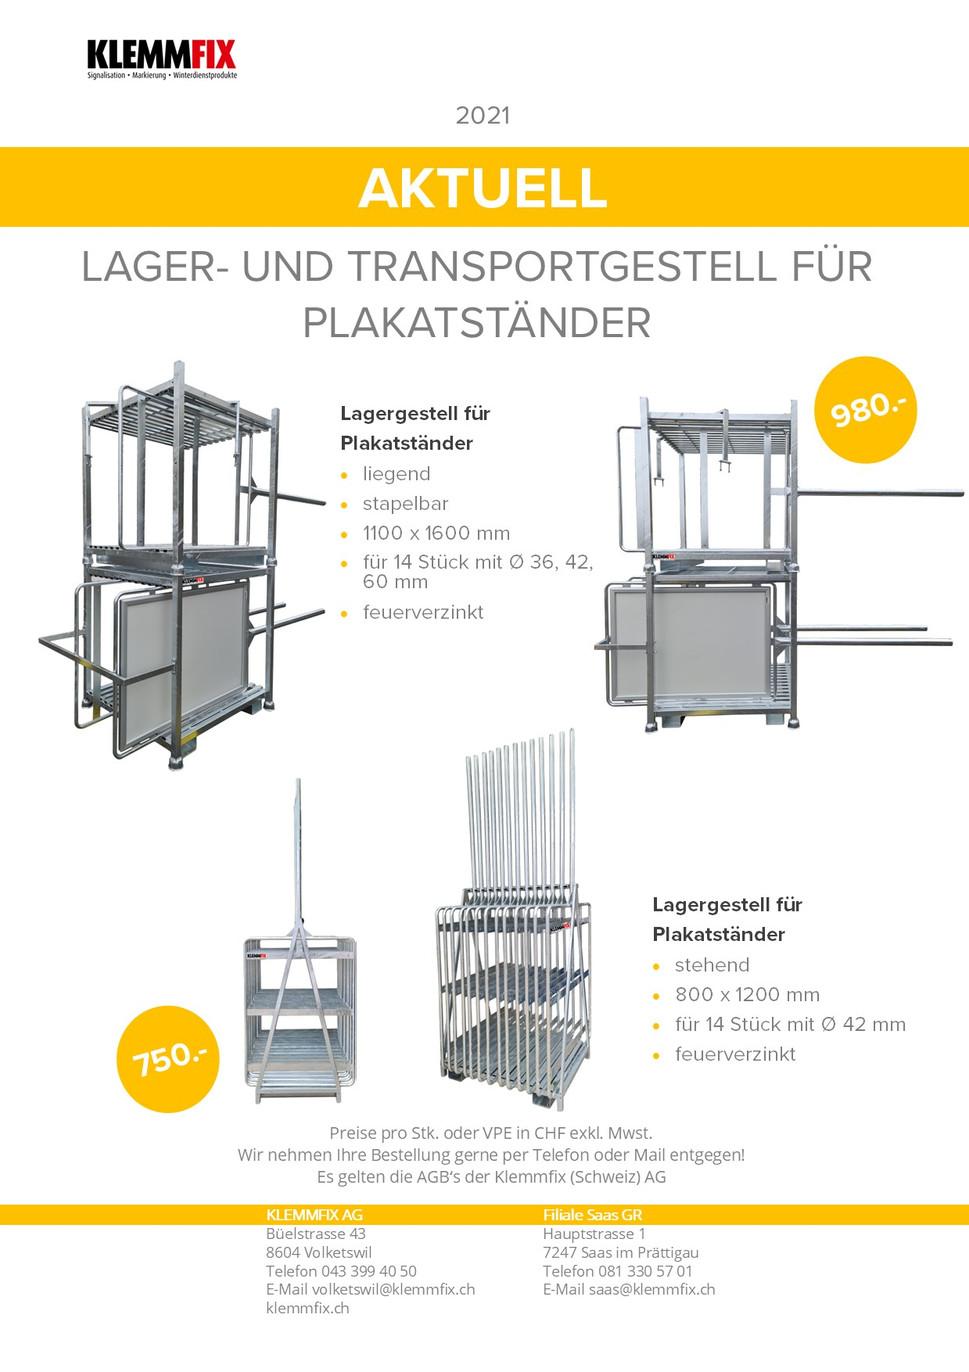 Lager- Transportgestell für Plakatstände